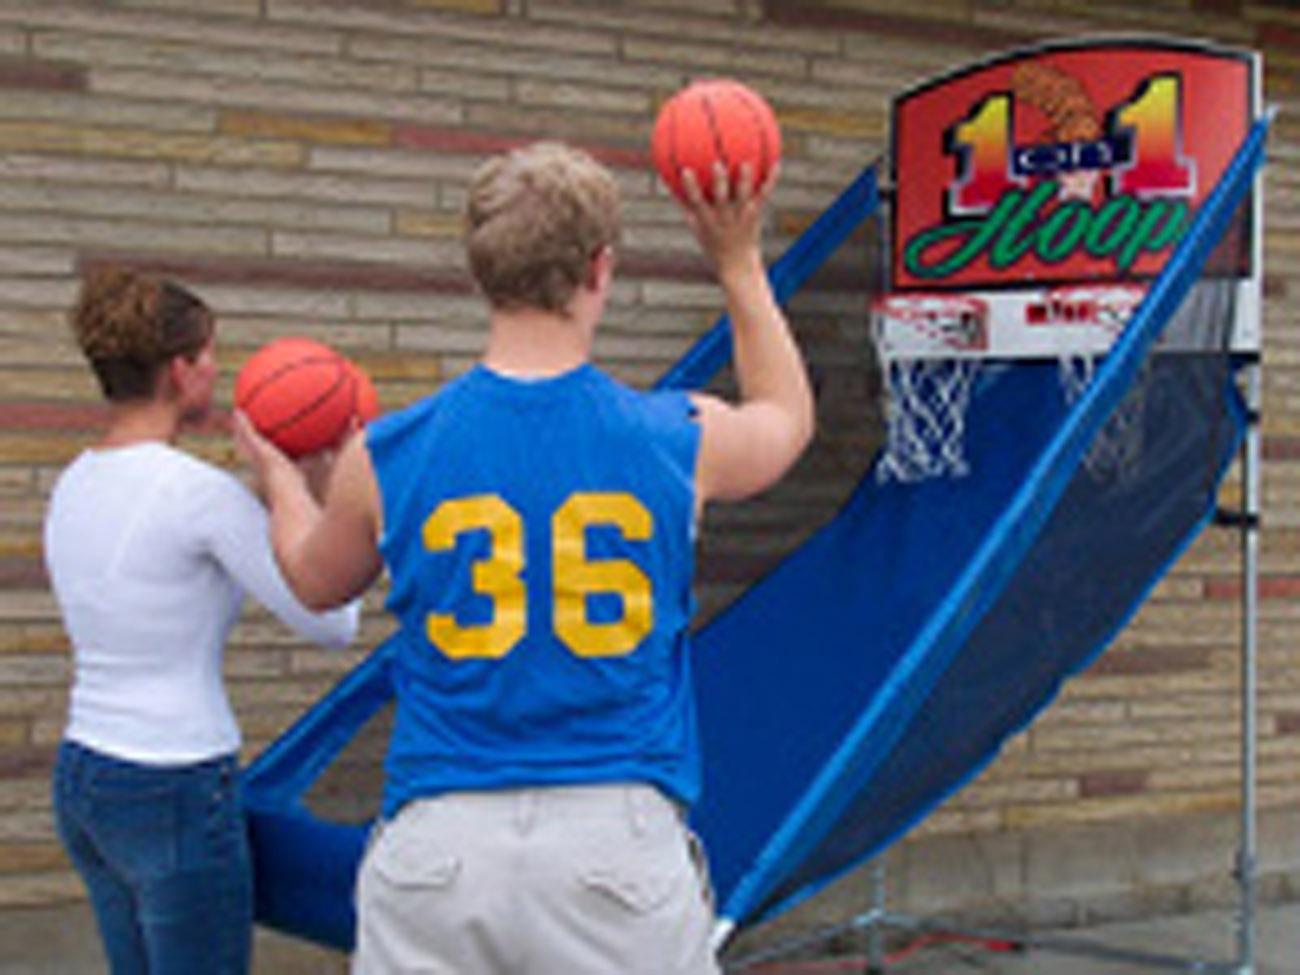 Digital Basketball Game Rental